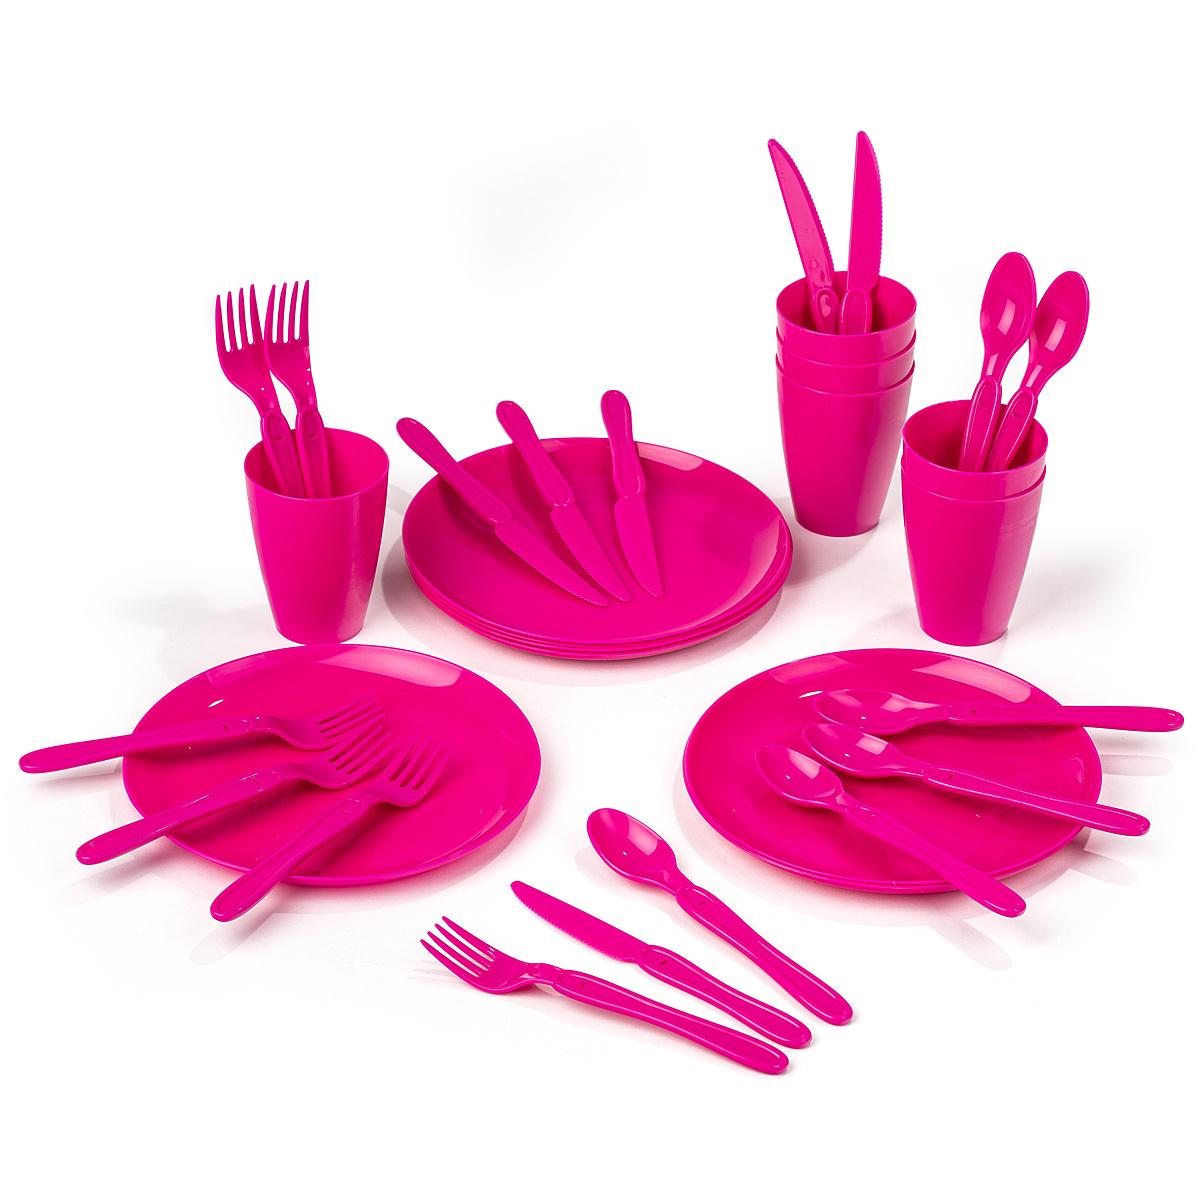 Koopman Sada plastového riadu Piknik, 31 ks, ružová